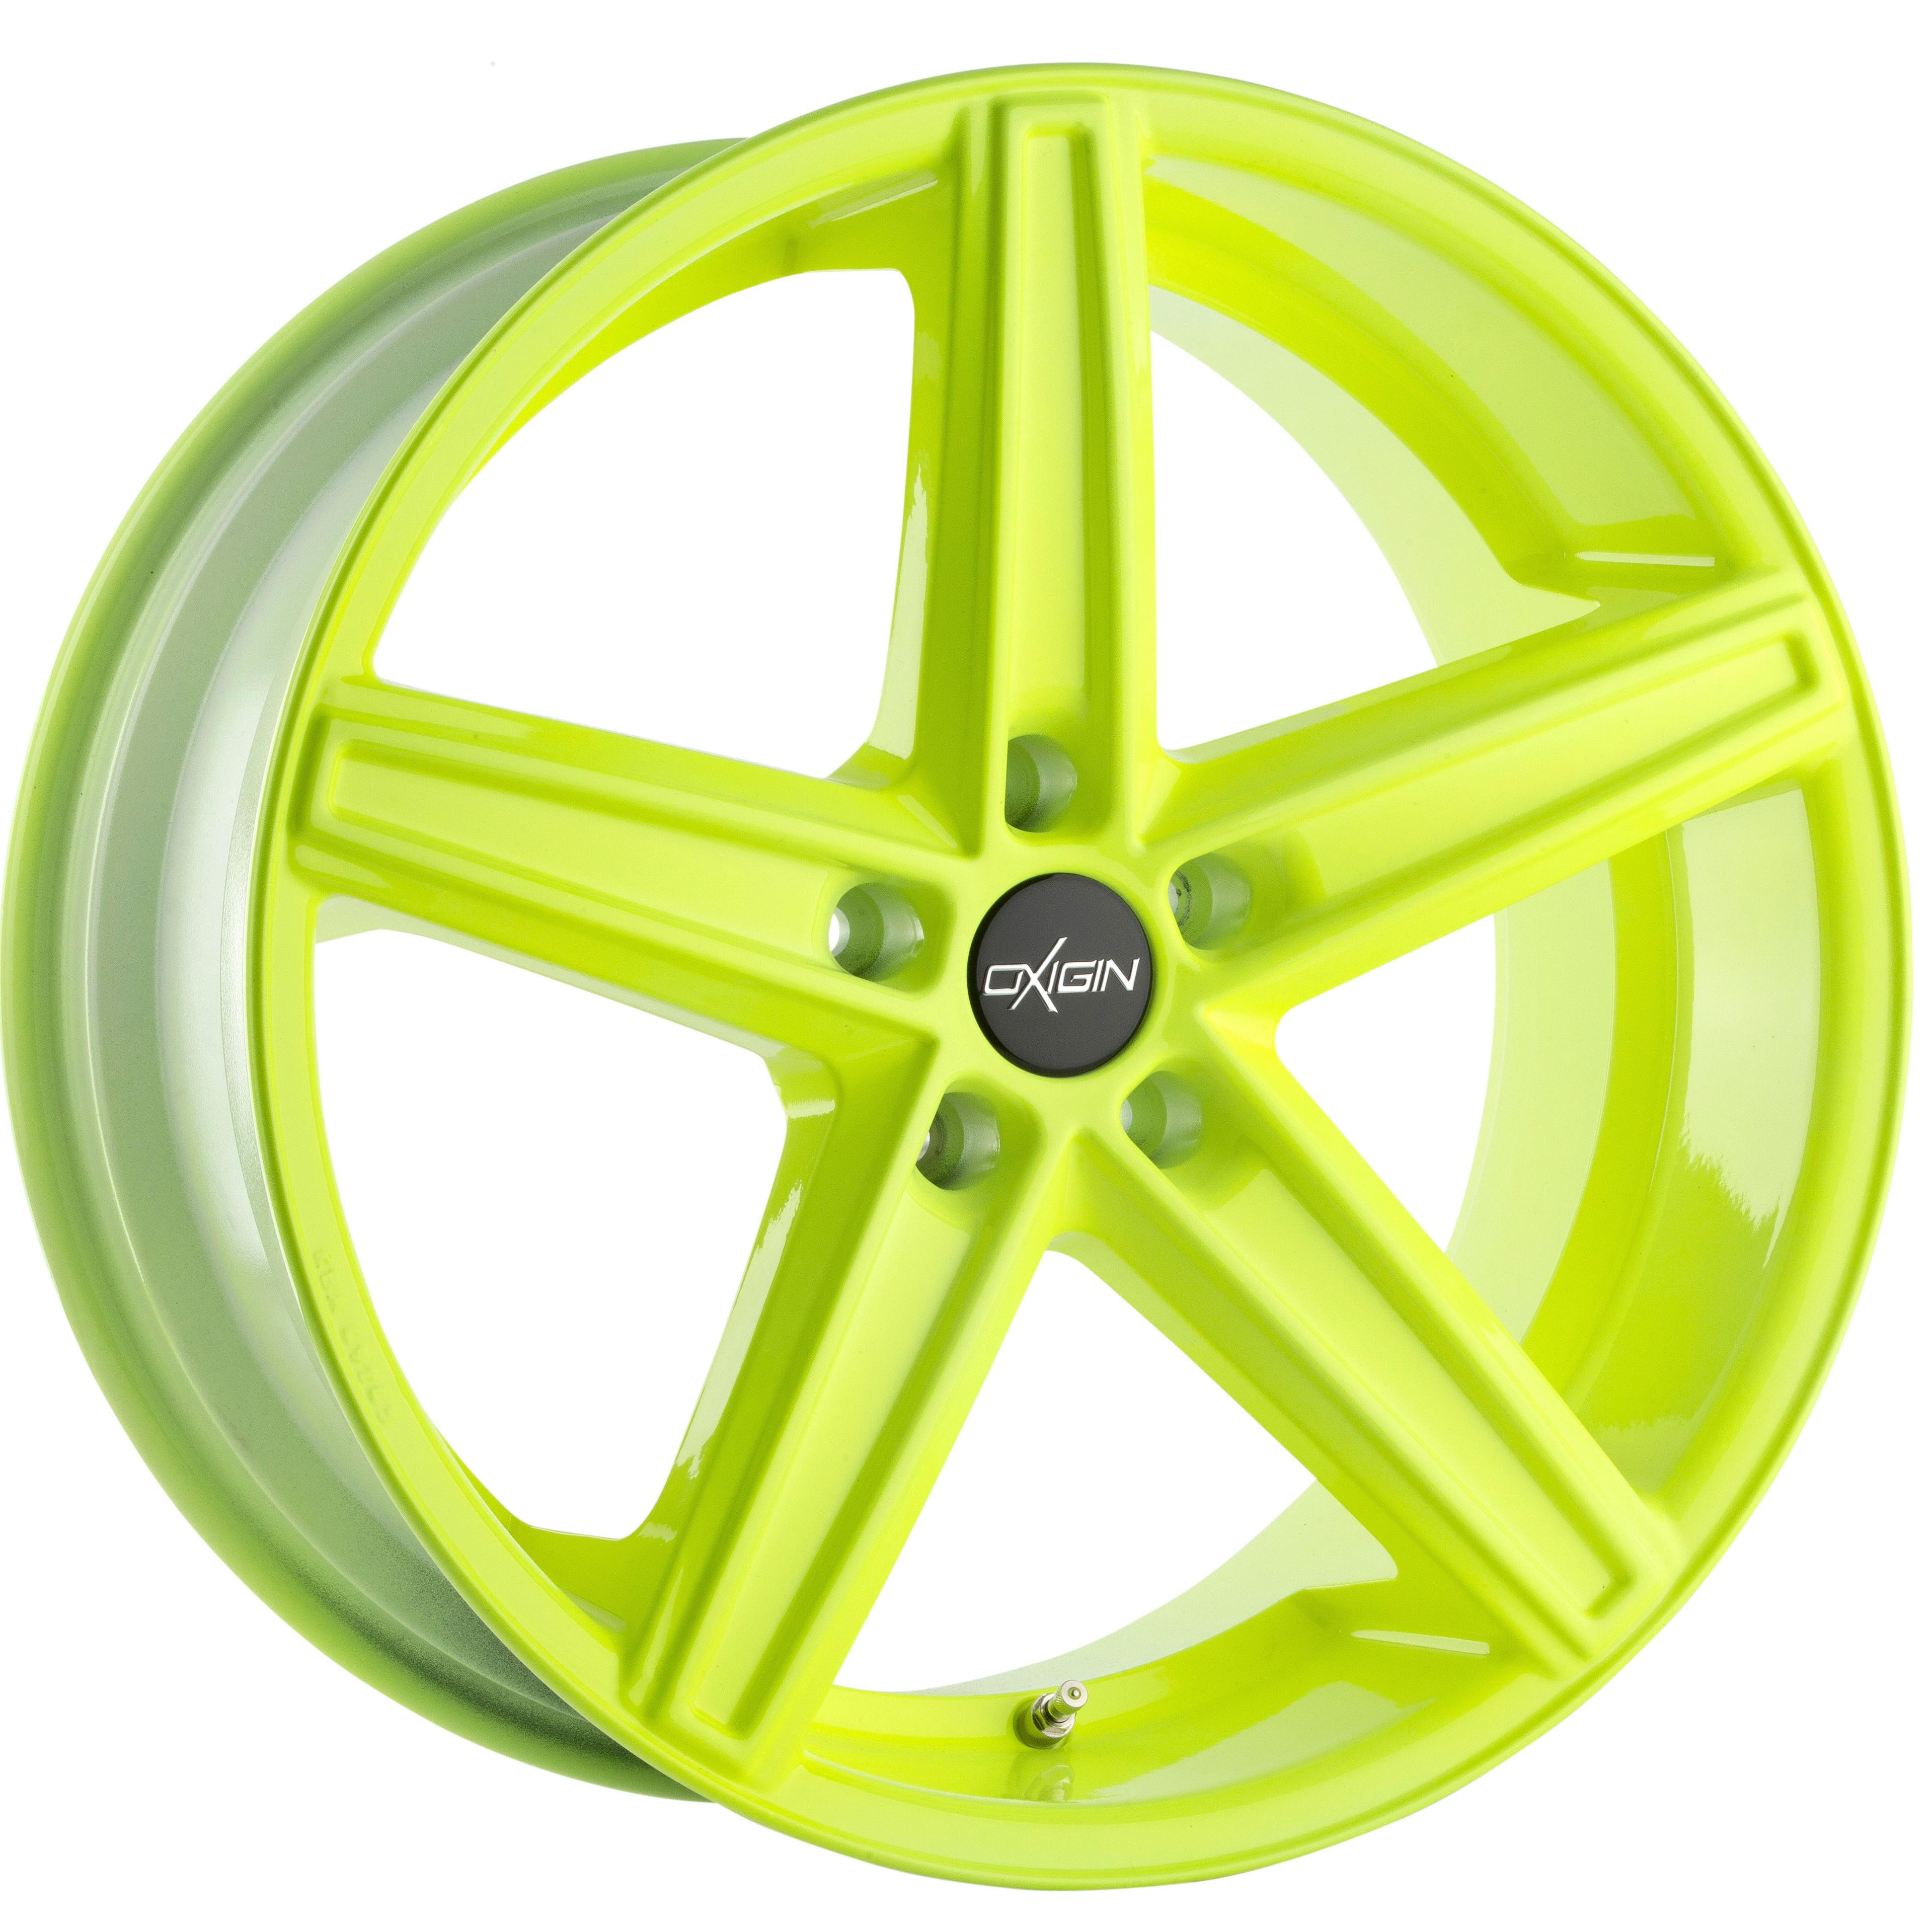 Oxigin OX 18 neon yellow